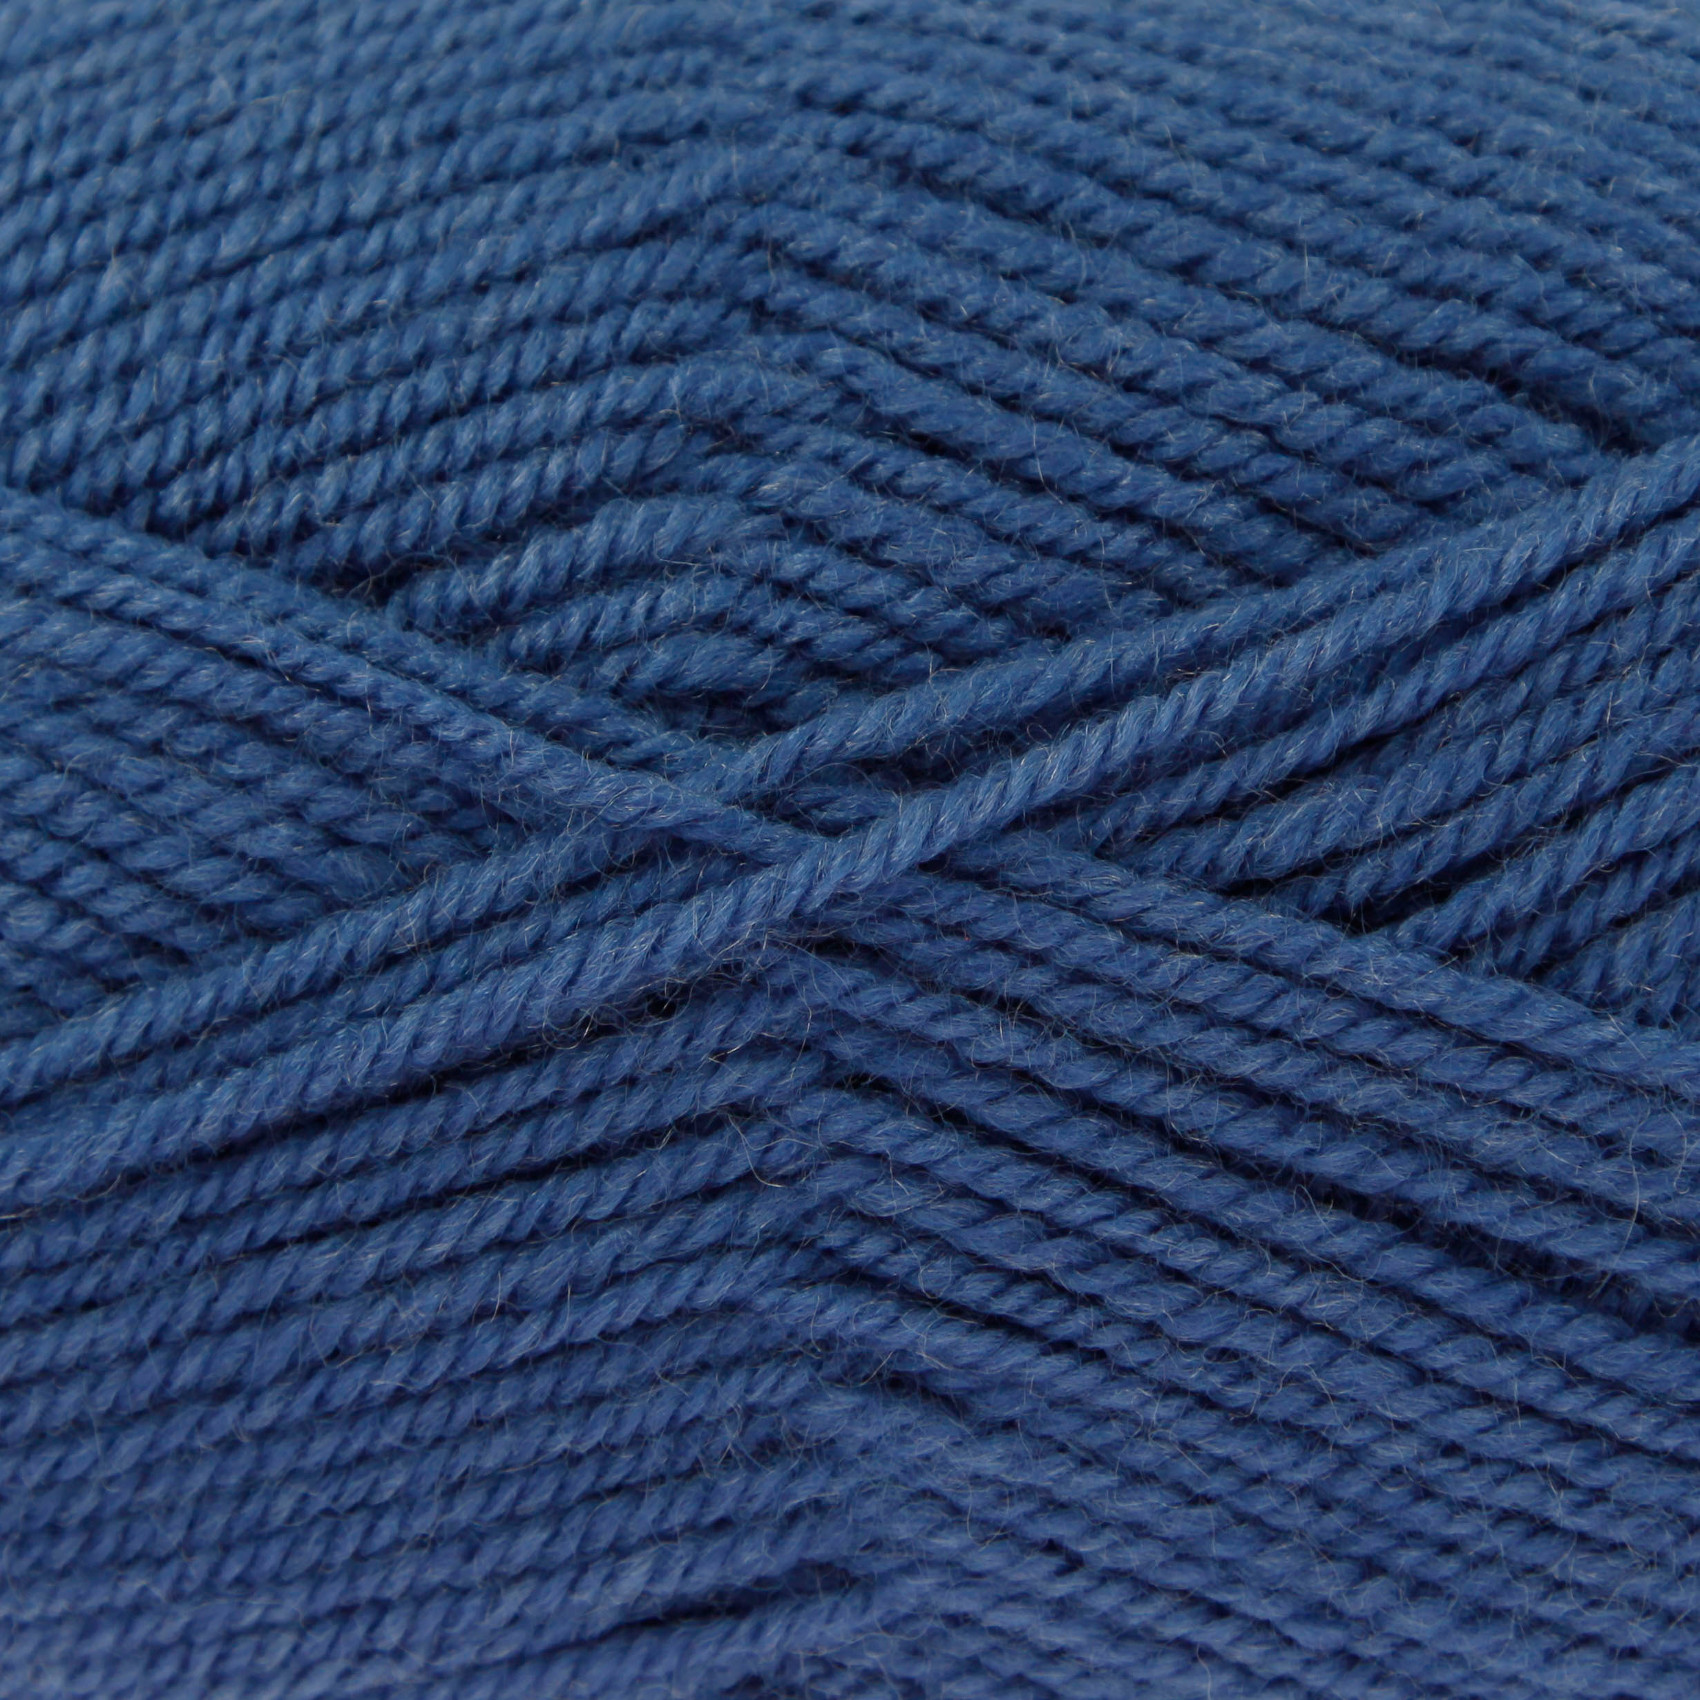 Knitting Yarn Design : King cole fashion aran yarn free knitting pattern